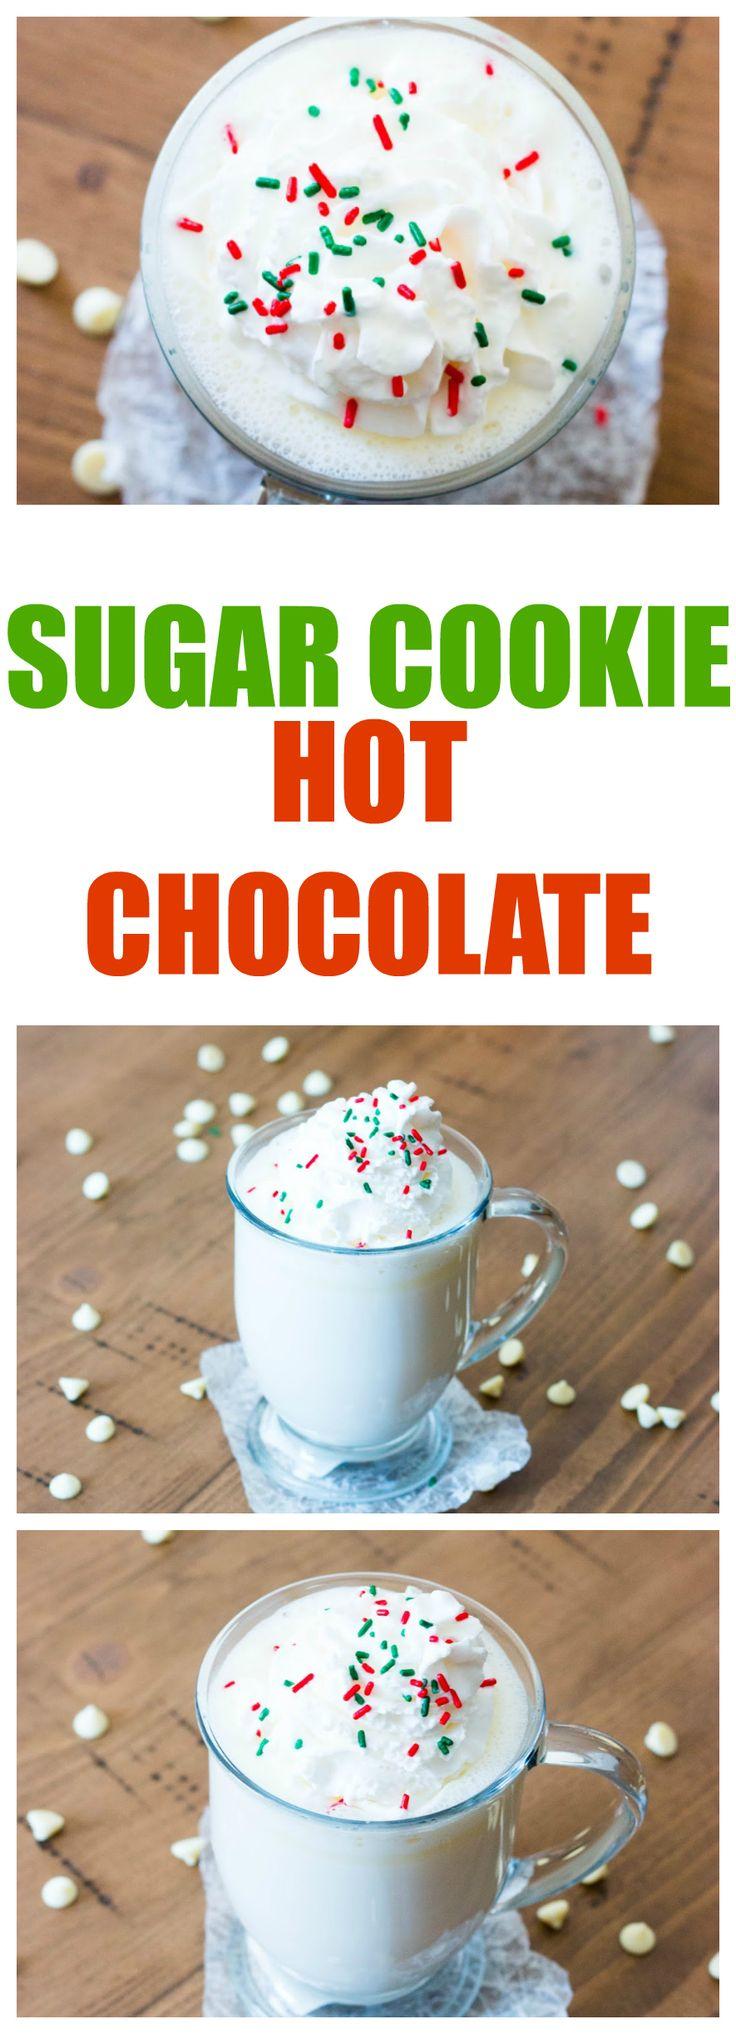 Sugar Cookie Hot Chocolate Seasons, Walmart and Hot